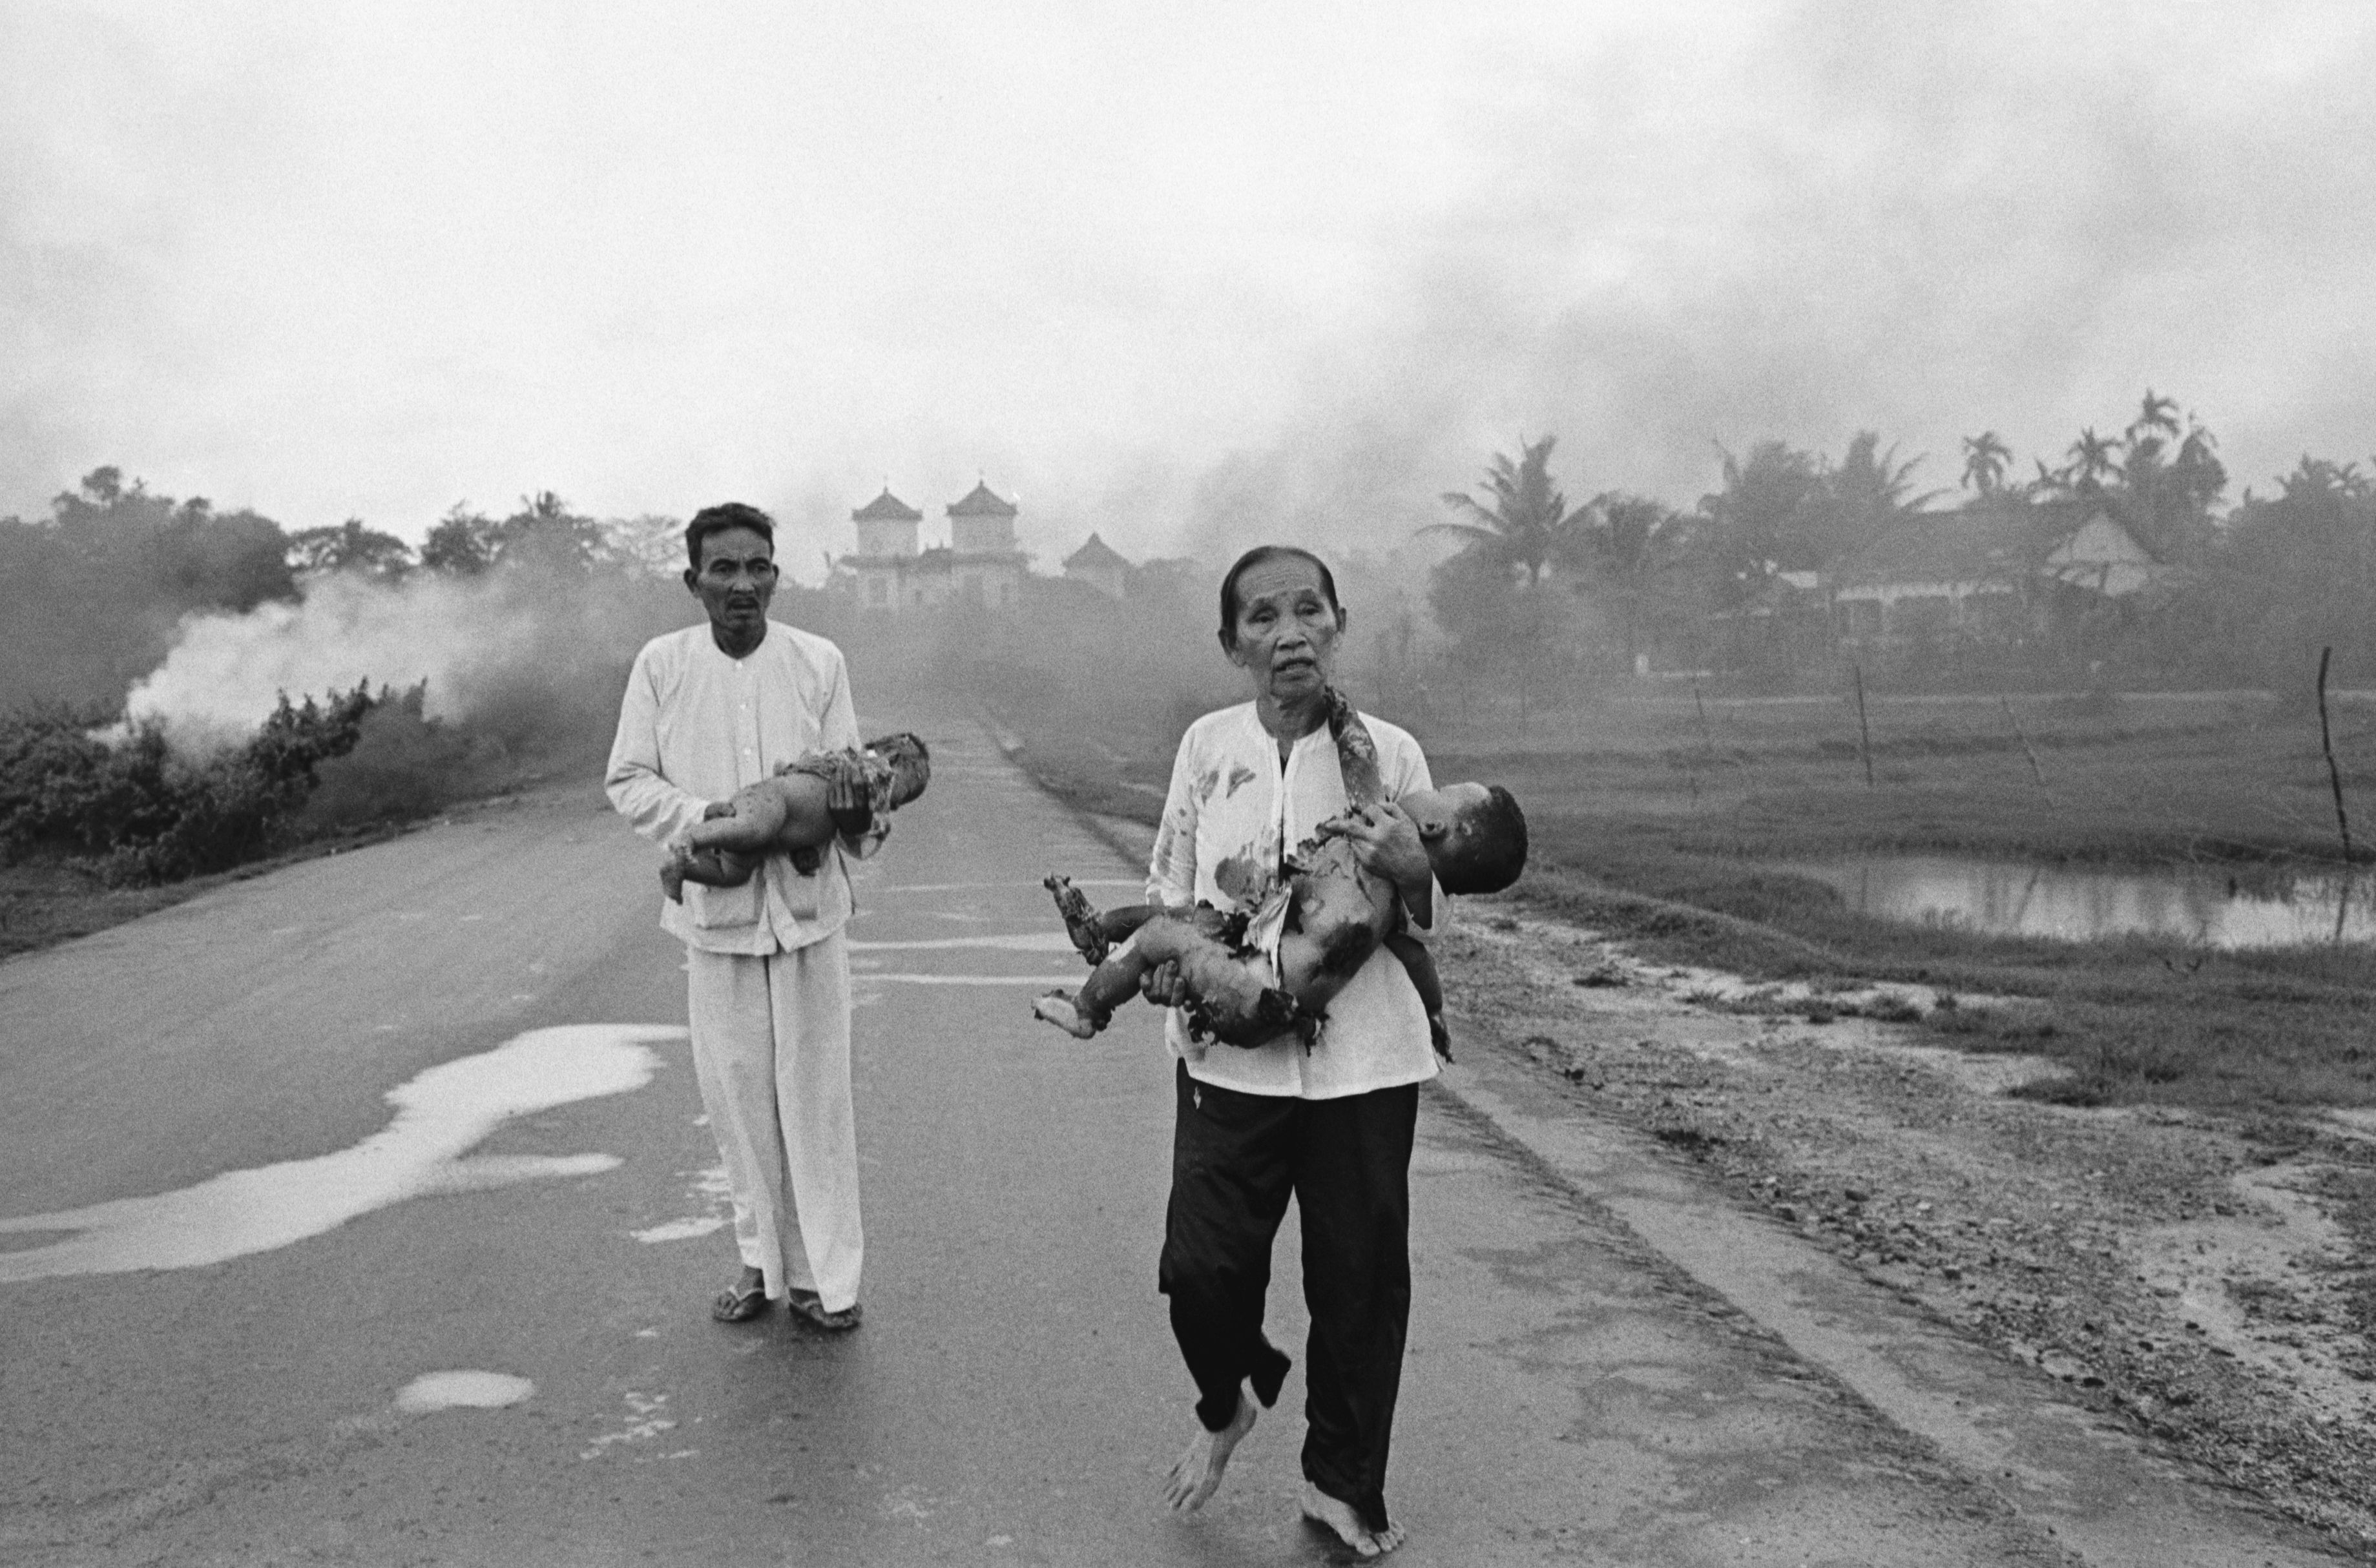 Napalm and Agent Orange in the Vietnam War